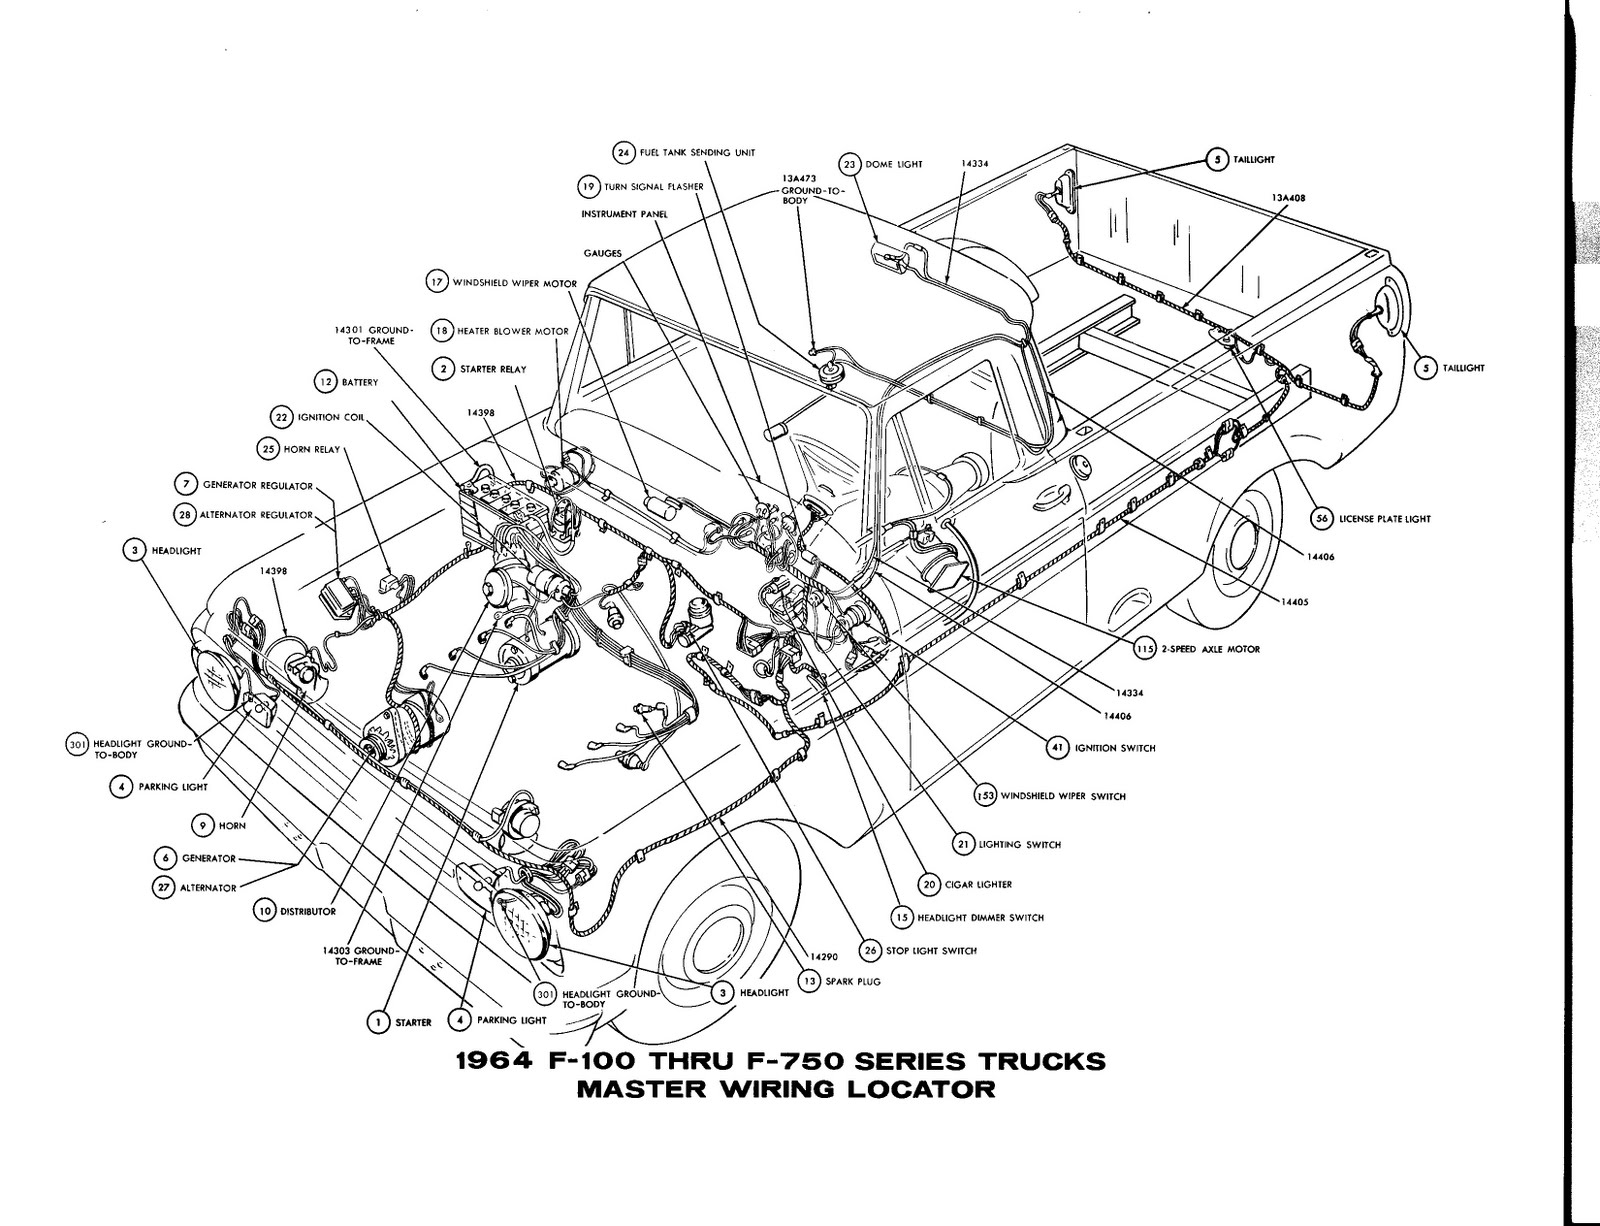 medium resolution of 1964 ford f 100 thru f 750 truck master wiring